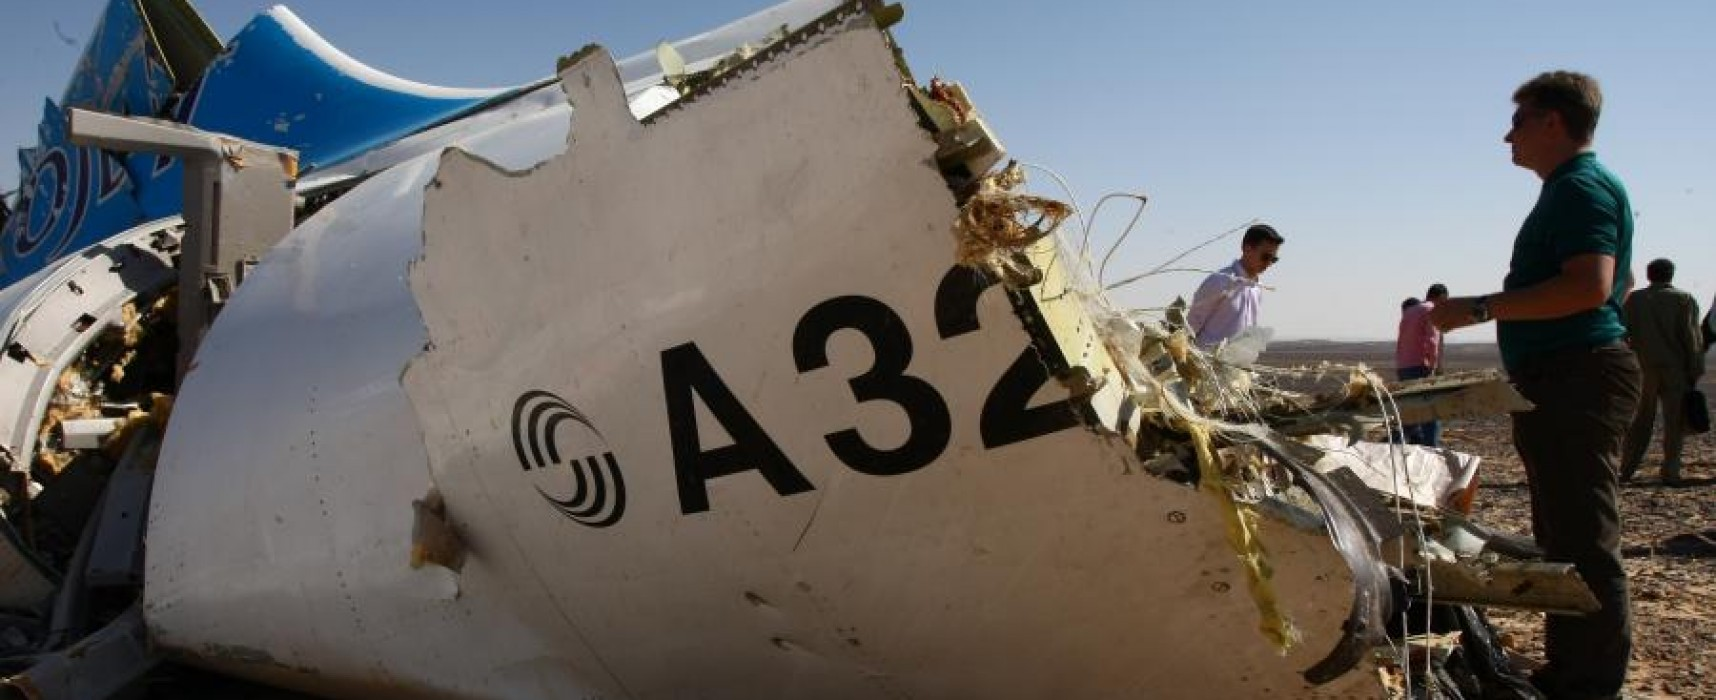 Kremlin's habit of hiding the truth: A321 case